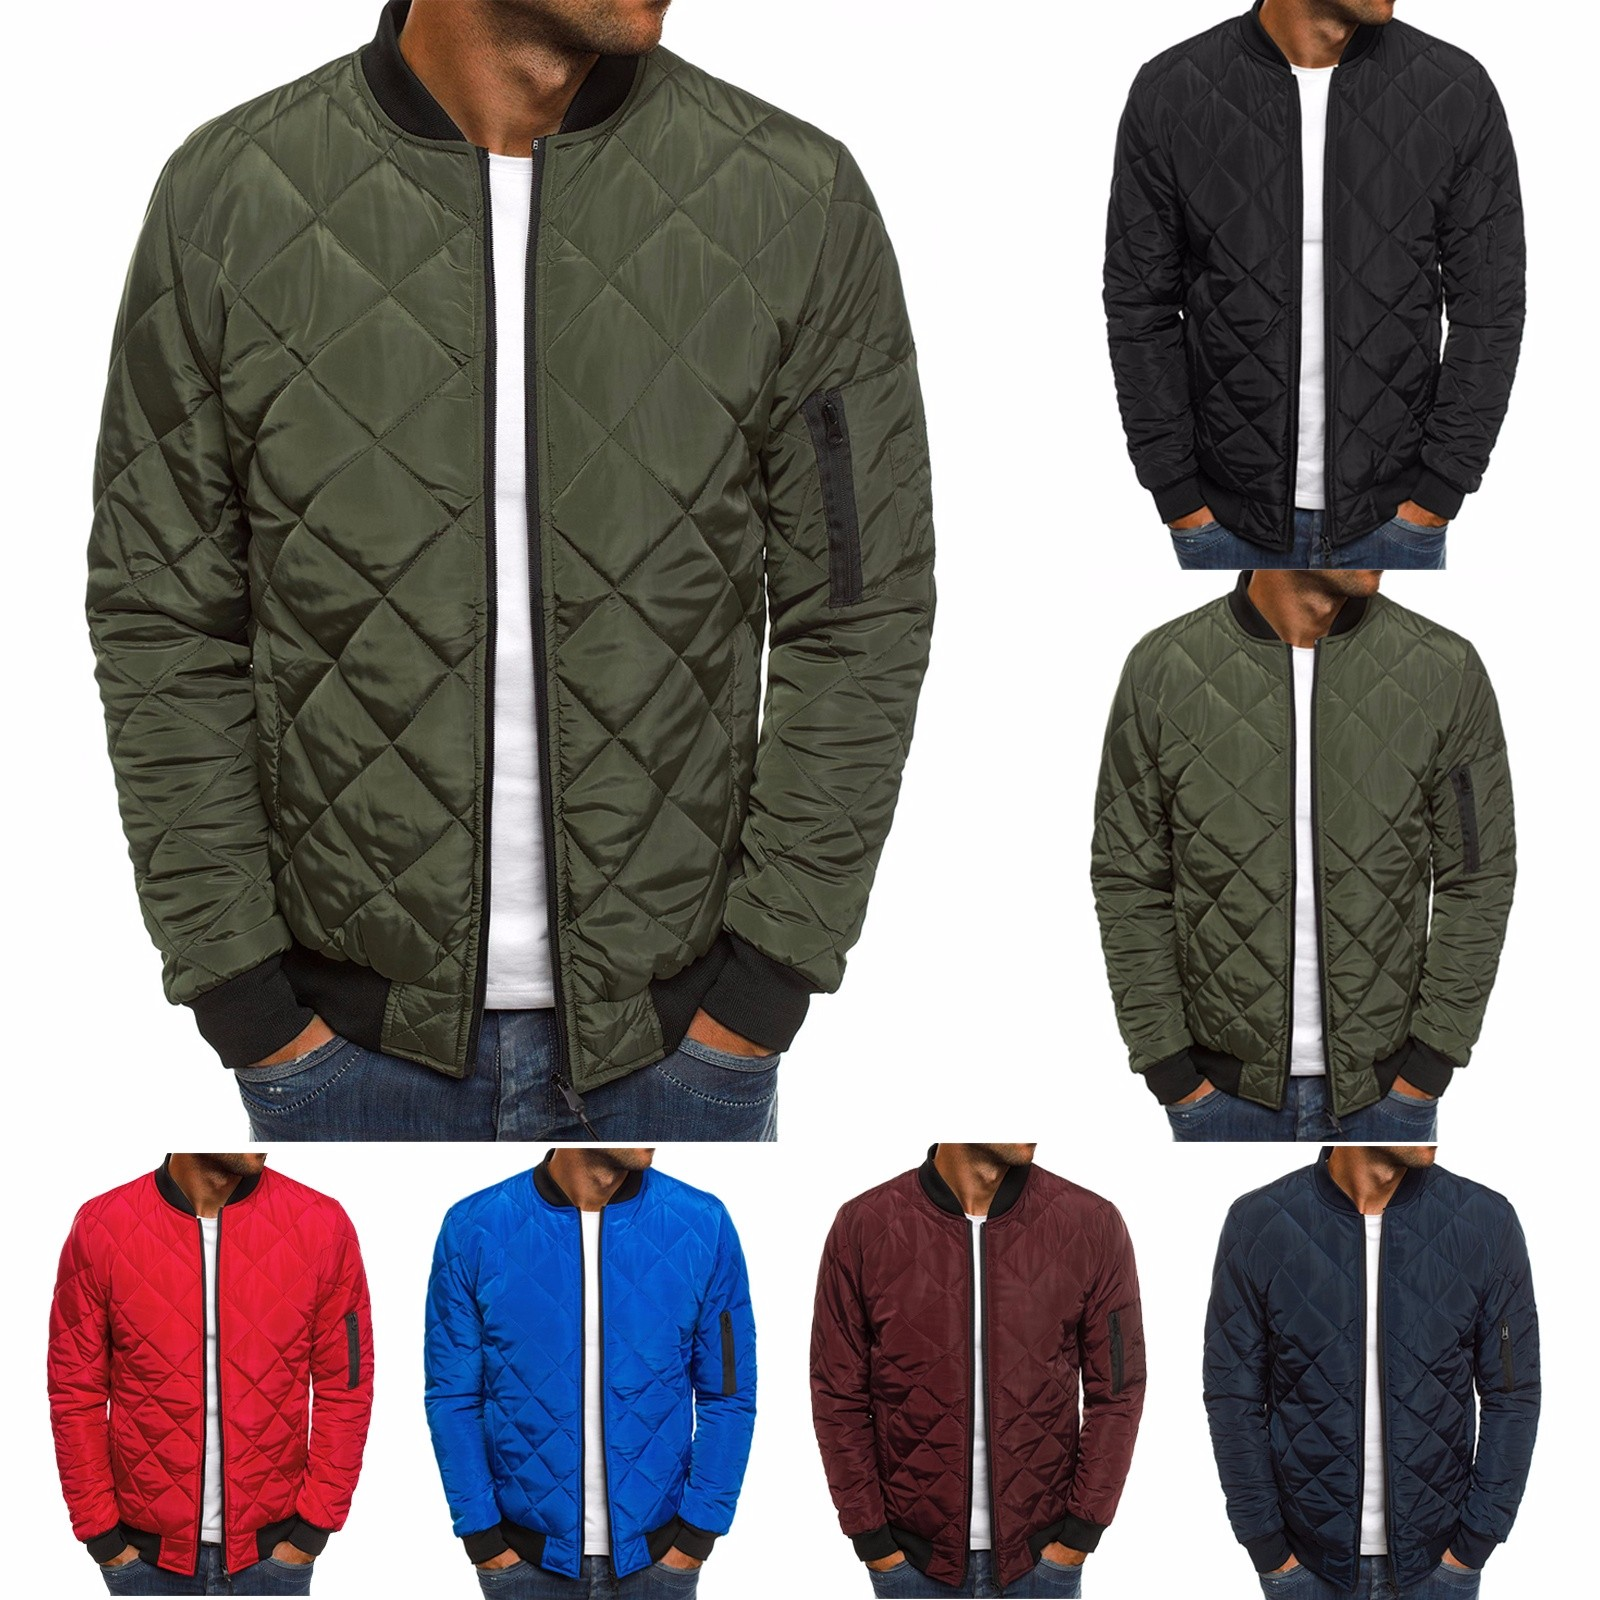 ZOGAA Men Casual Plaid   Parkas   Jacket Wind Breaker Solid Color Brand Overcoat Winter Clothes Zipper Jackets men clothes